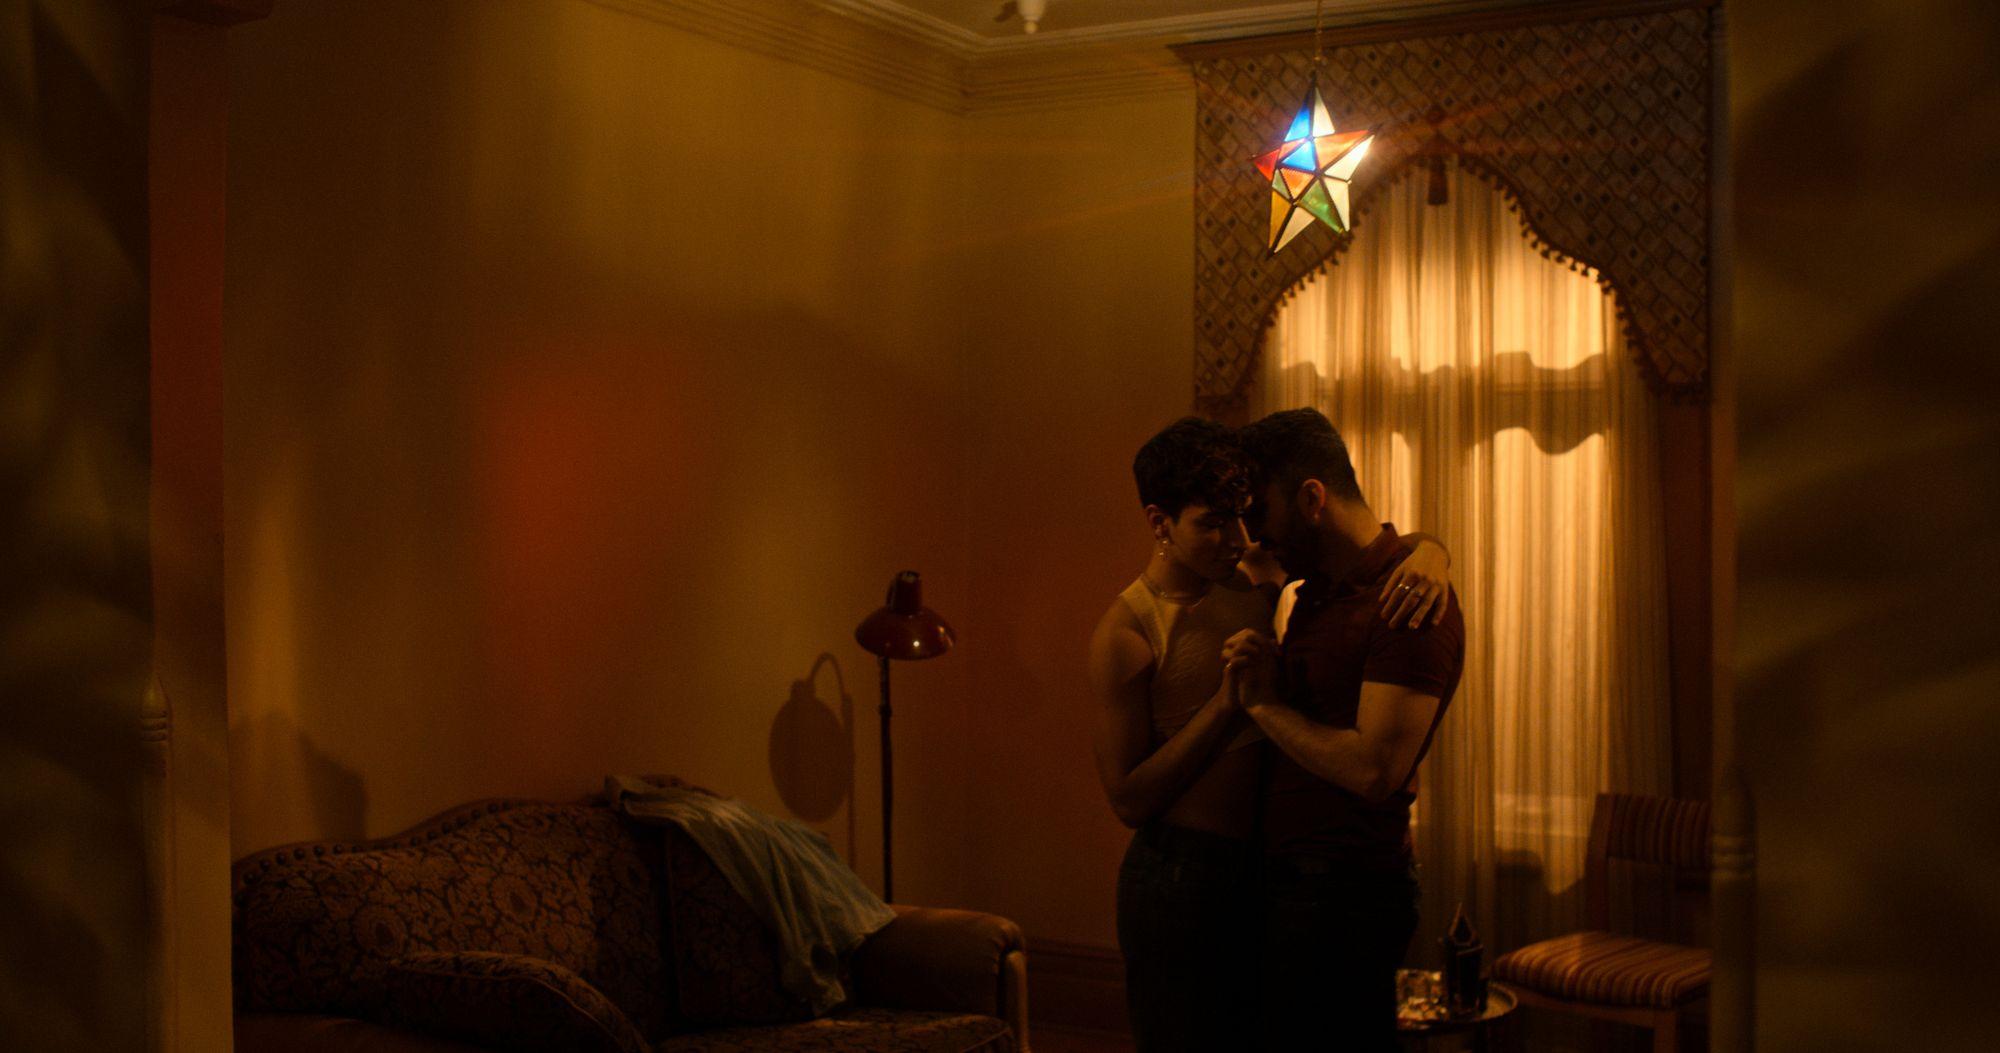 EP05/《The Son》:Rafiq 在父親發現他是個同性戀者後,決定逃出敘利亞的家鄉。一路奔走四方的他,在最出乎意料的地方找到了自己的「歸宿」。